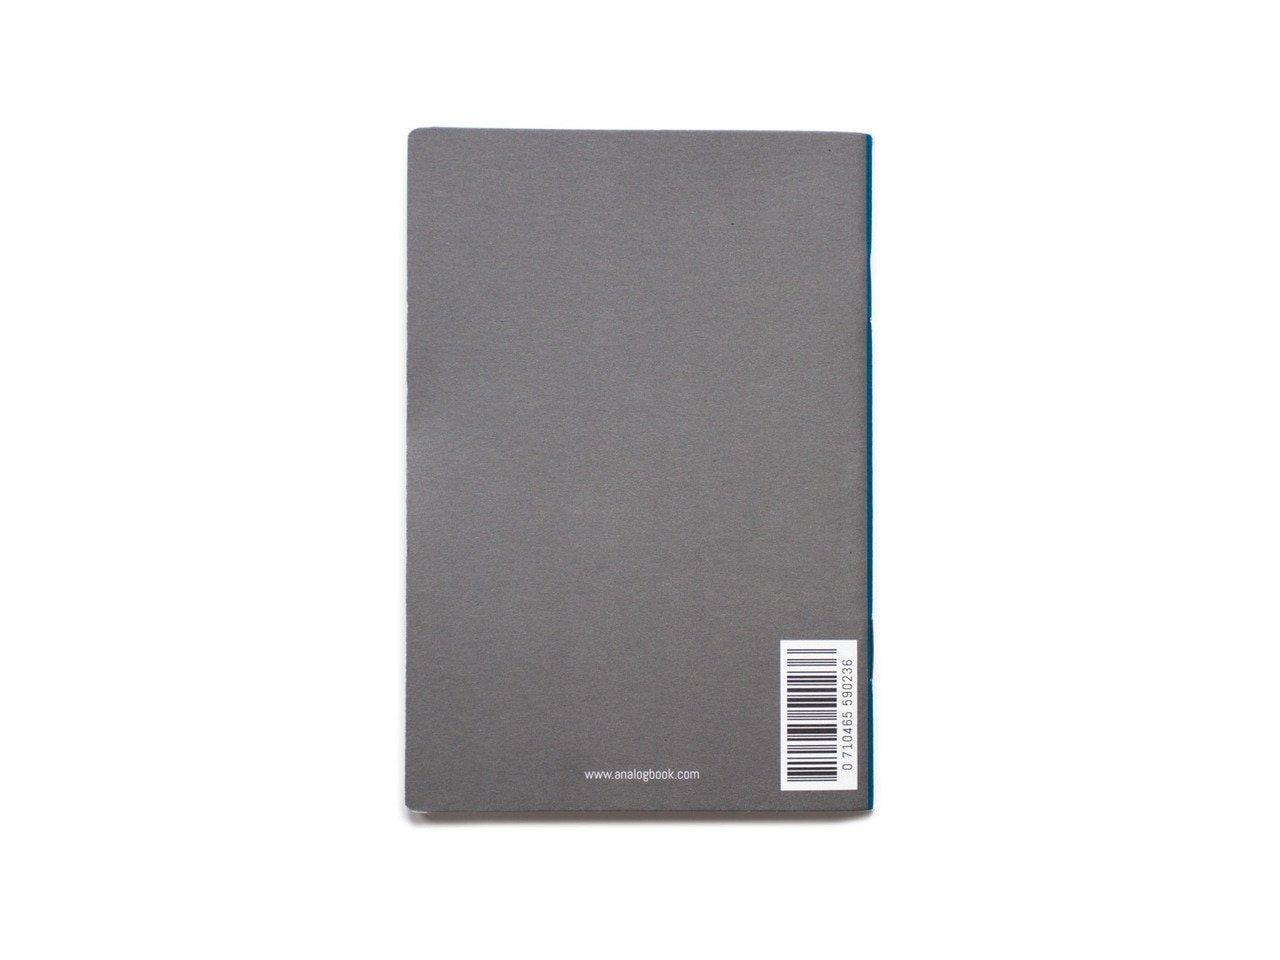 Analogbook Notebook - 120 Medium Format